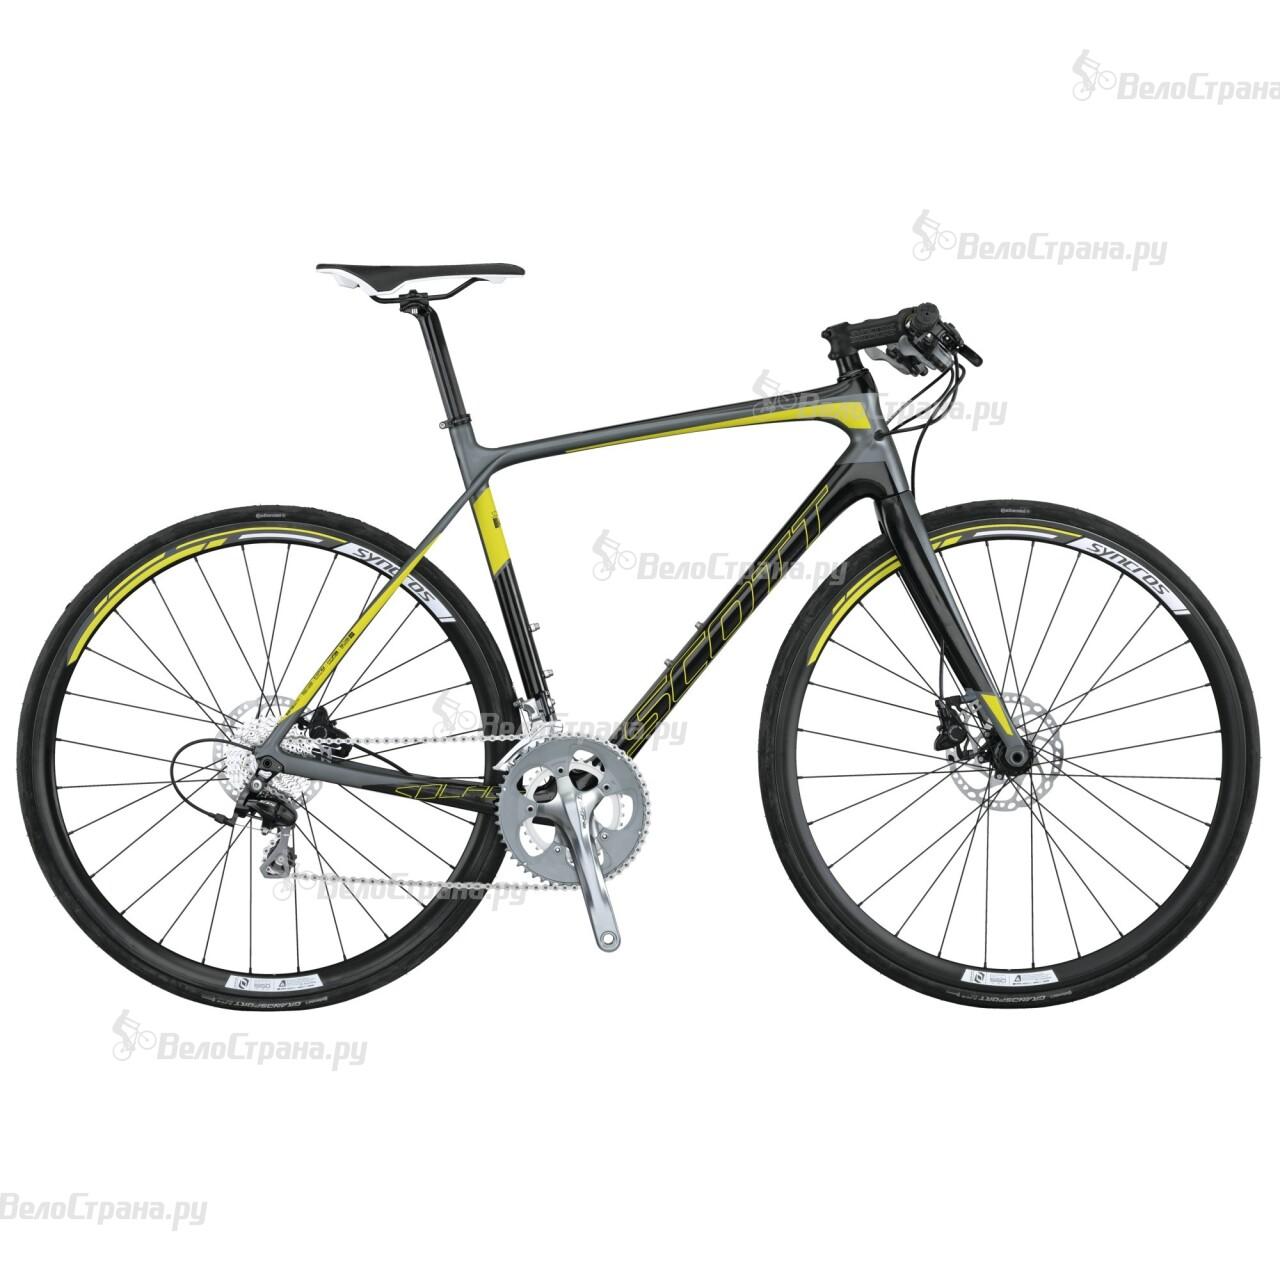 Велосипед Scott Solace 40 FB Disc (2015) велосипед scott contessa solace 15 compact 2015